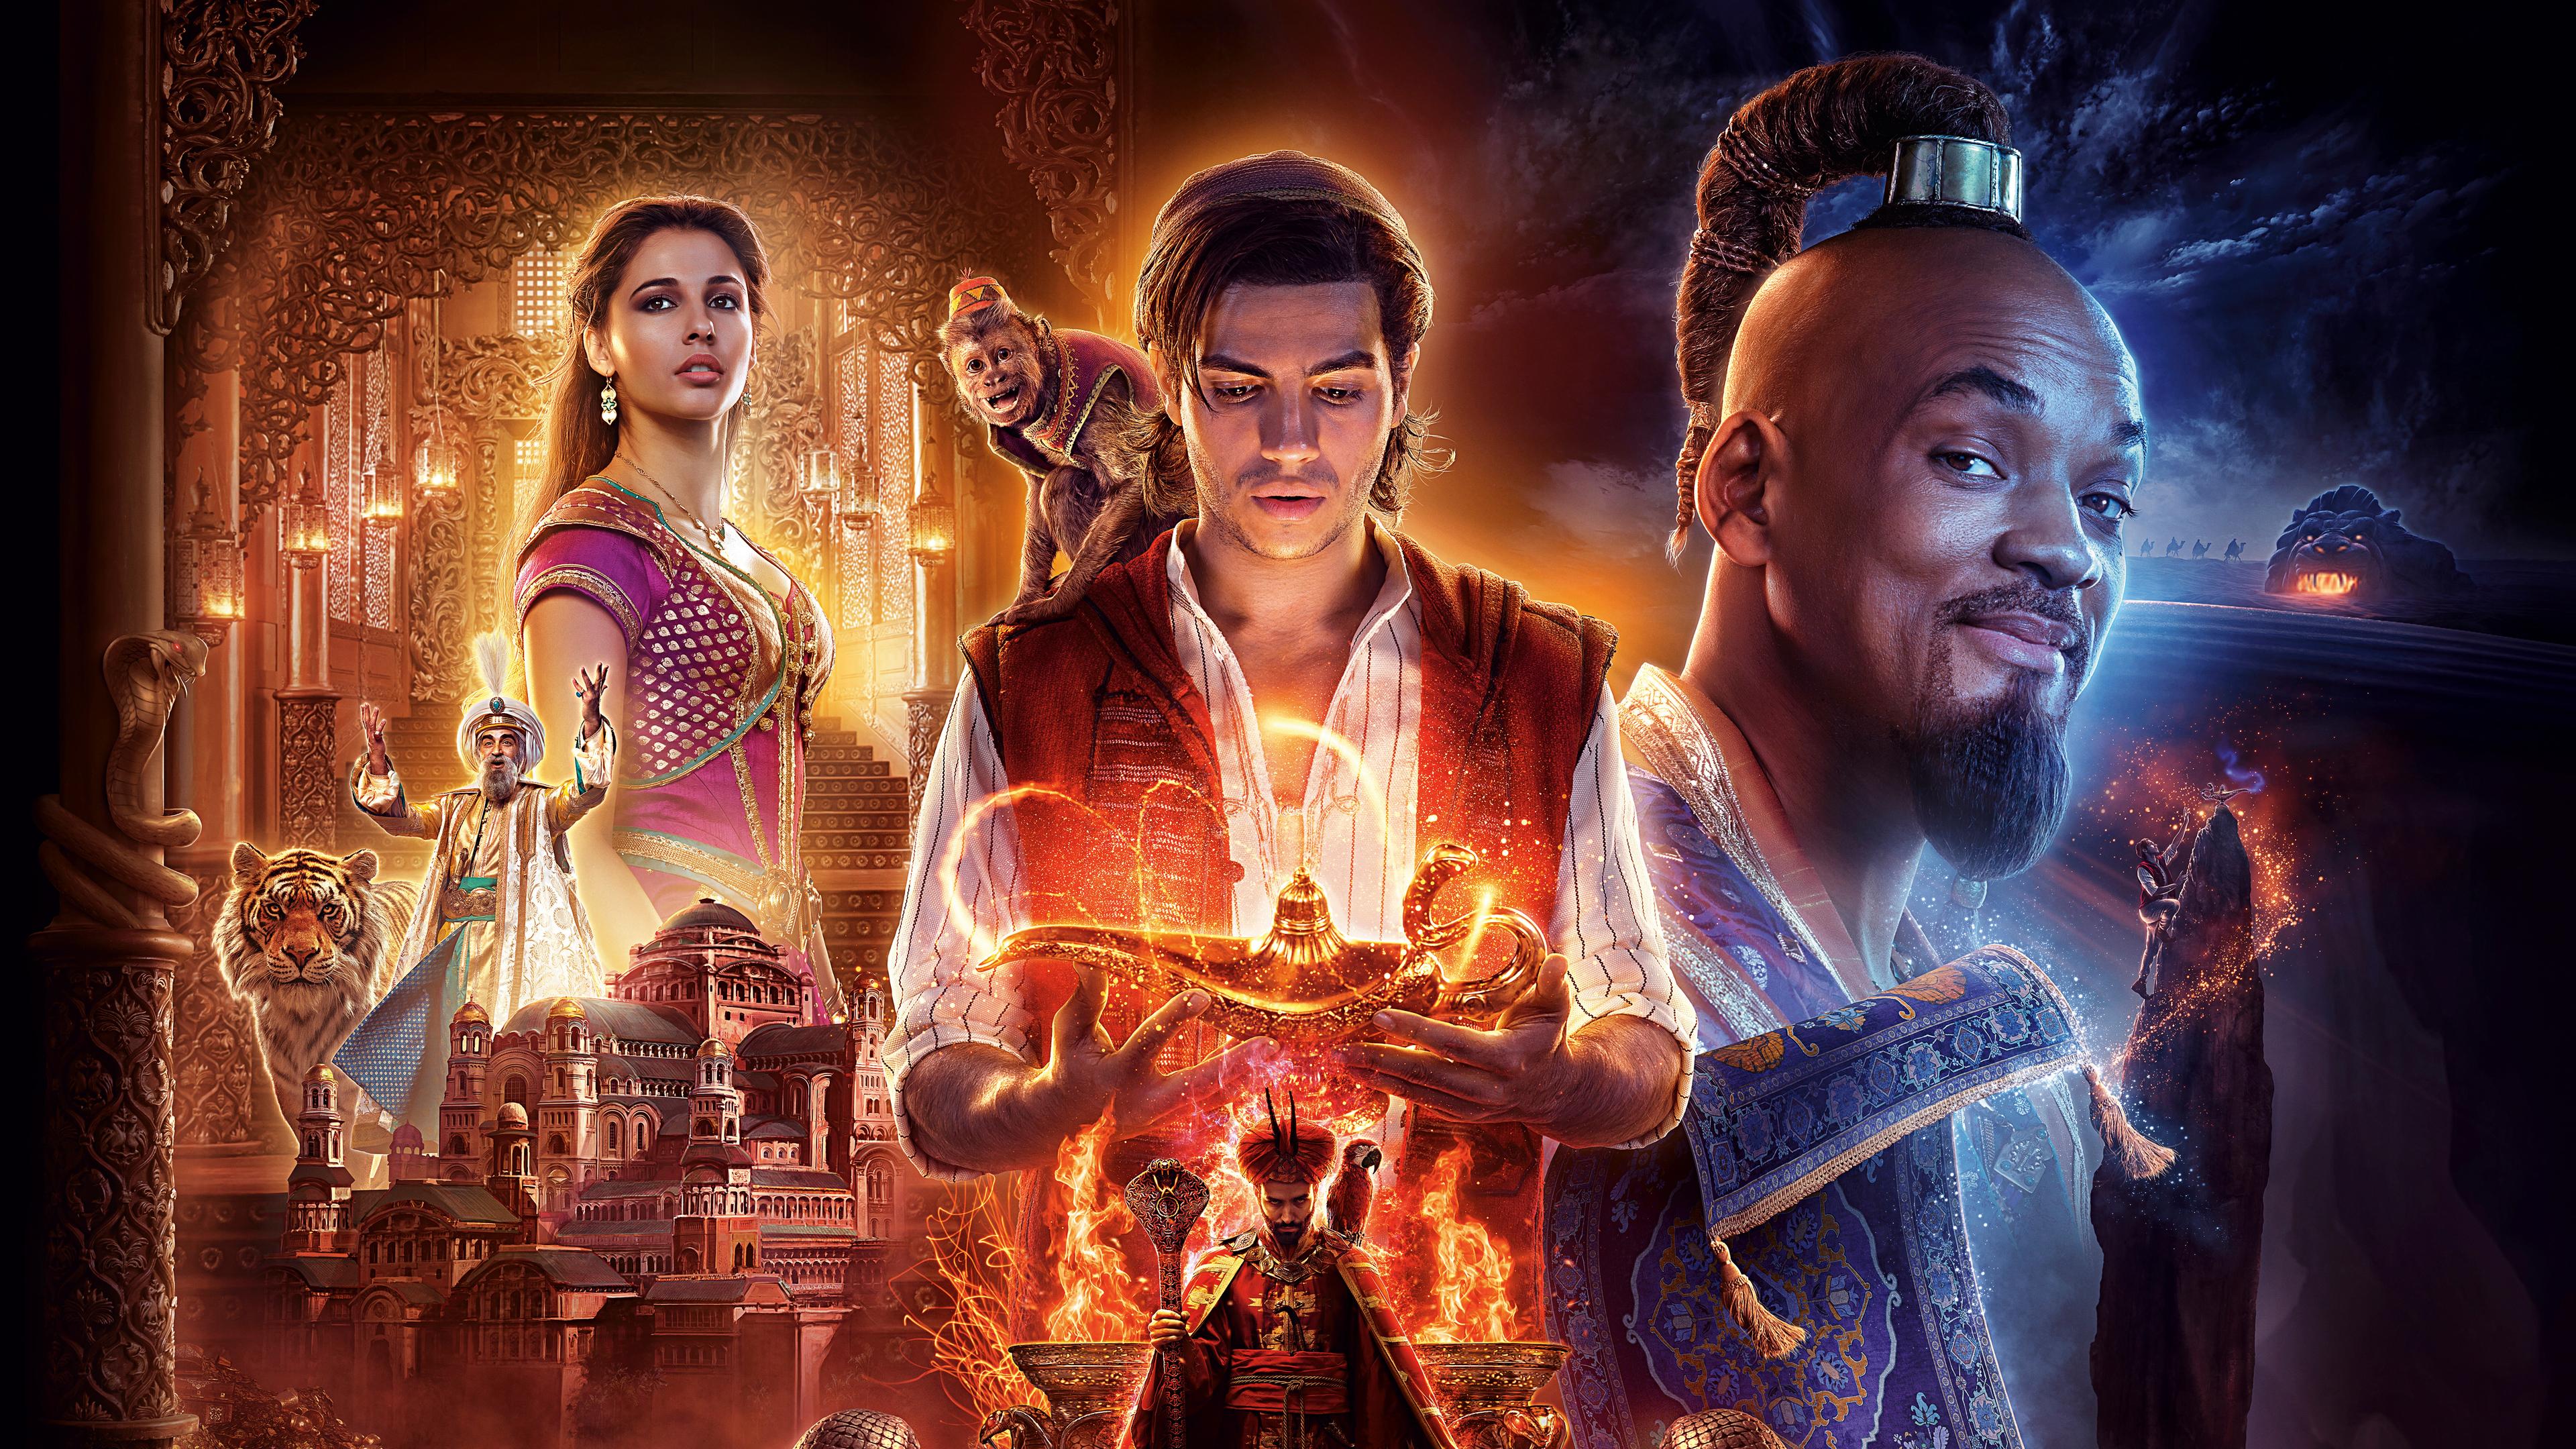 aladdin 2019 movie 4k 1558219657 - Aladdin 2019 Movie 4k - movies wallpapers, hd-wallpapers, aladdin wallpapers, aladdin movie wallpapers, 4k-wallpapers, 2019 movies wallpapers